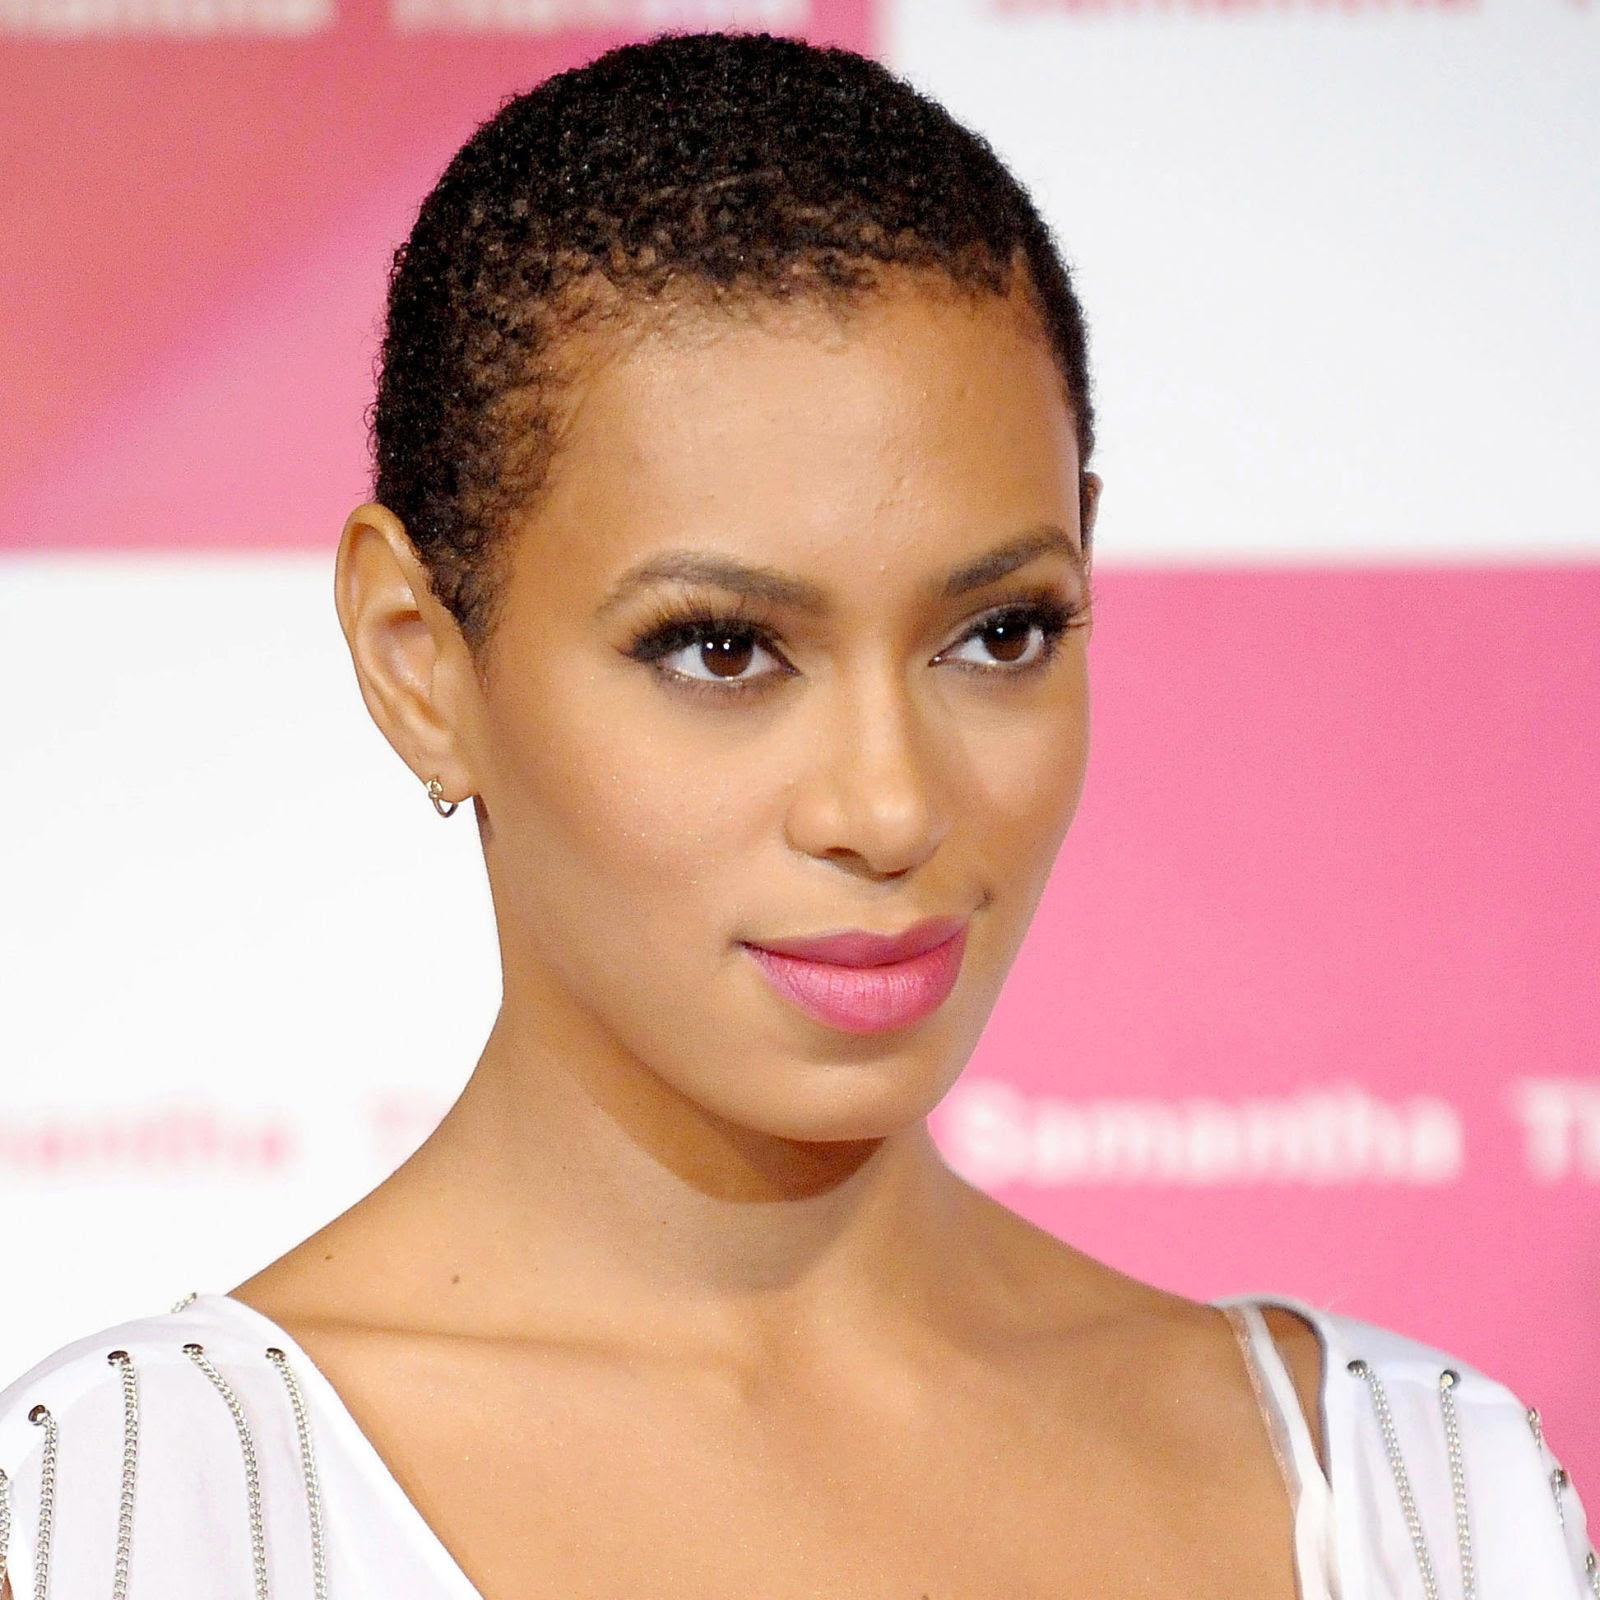 Jazzy Black  Women  Short  Hairstyles  2019 Hairstyles  2019